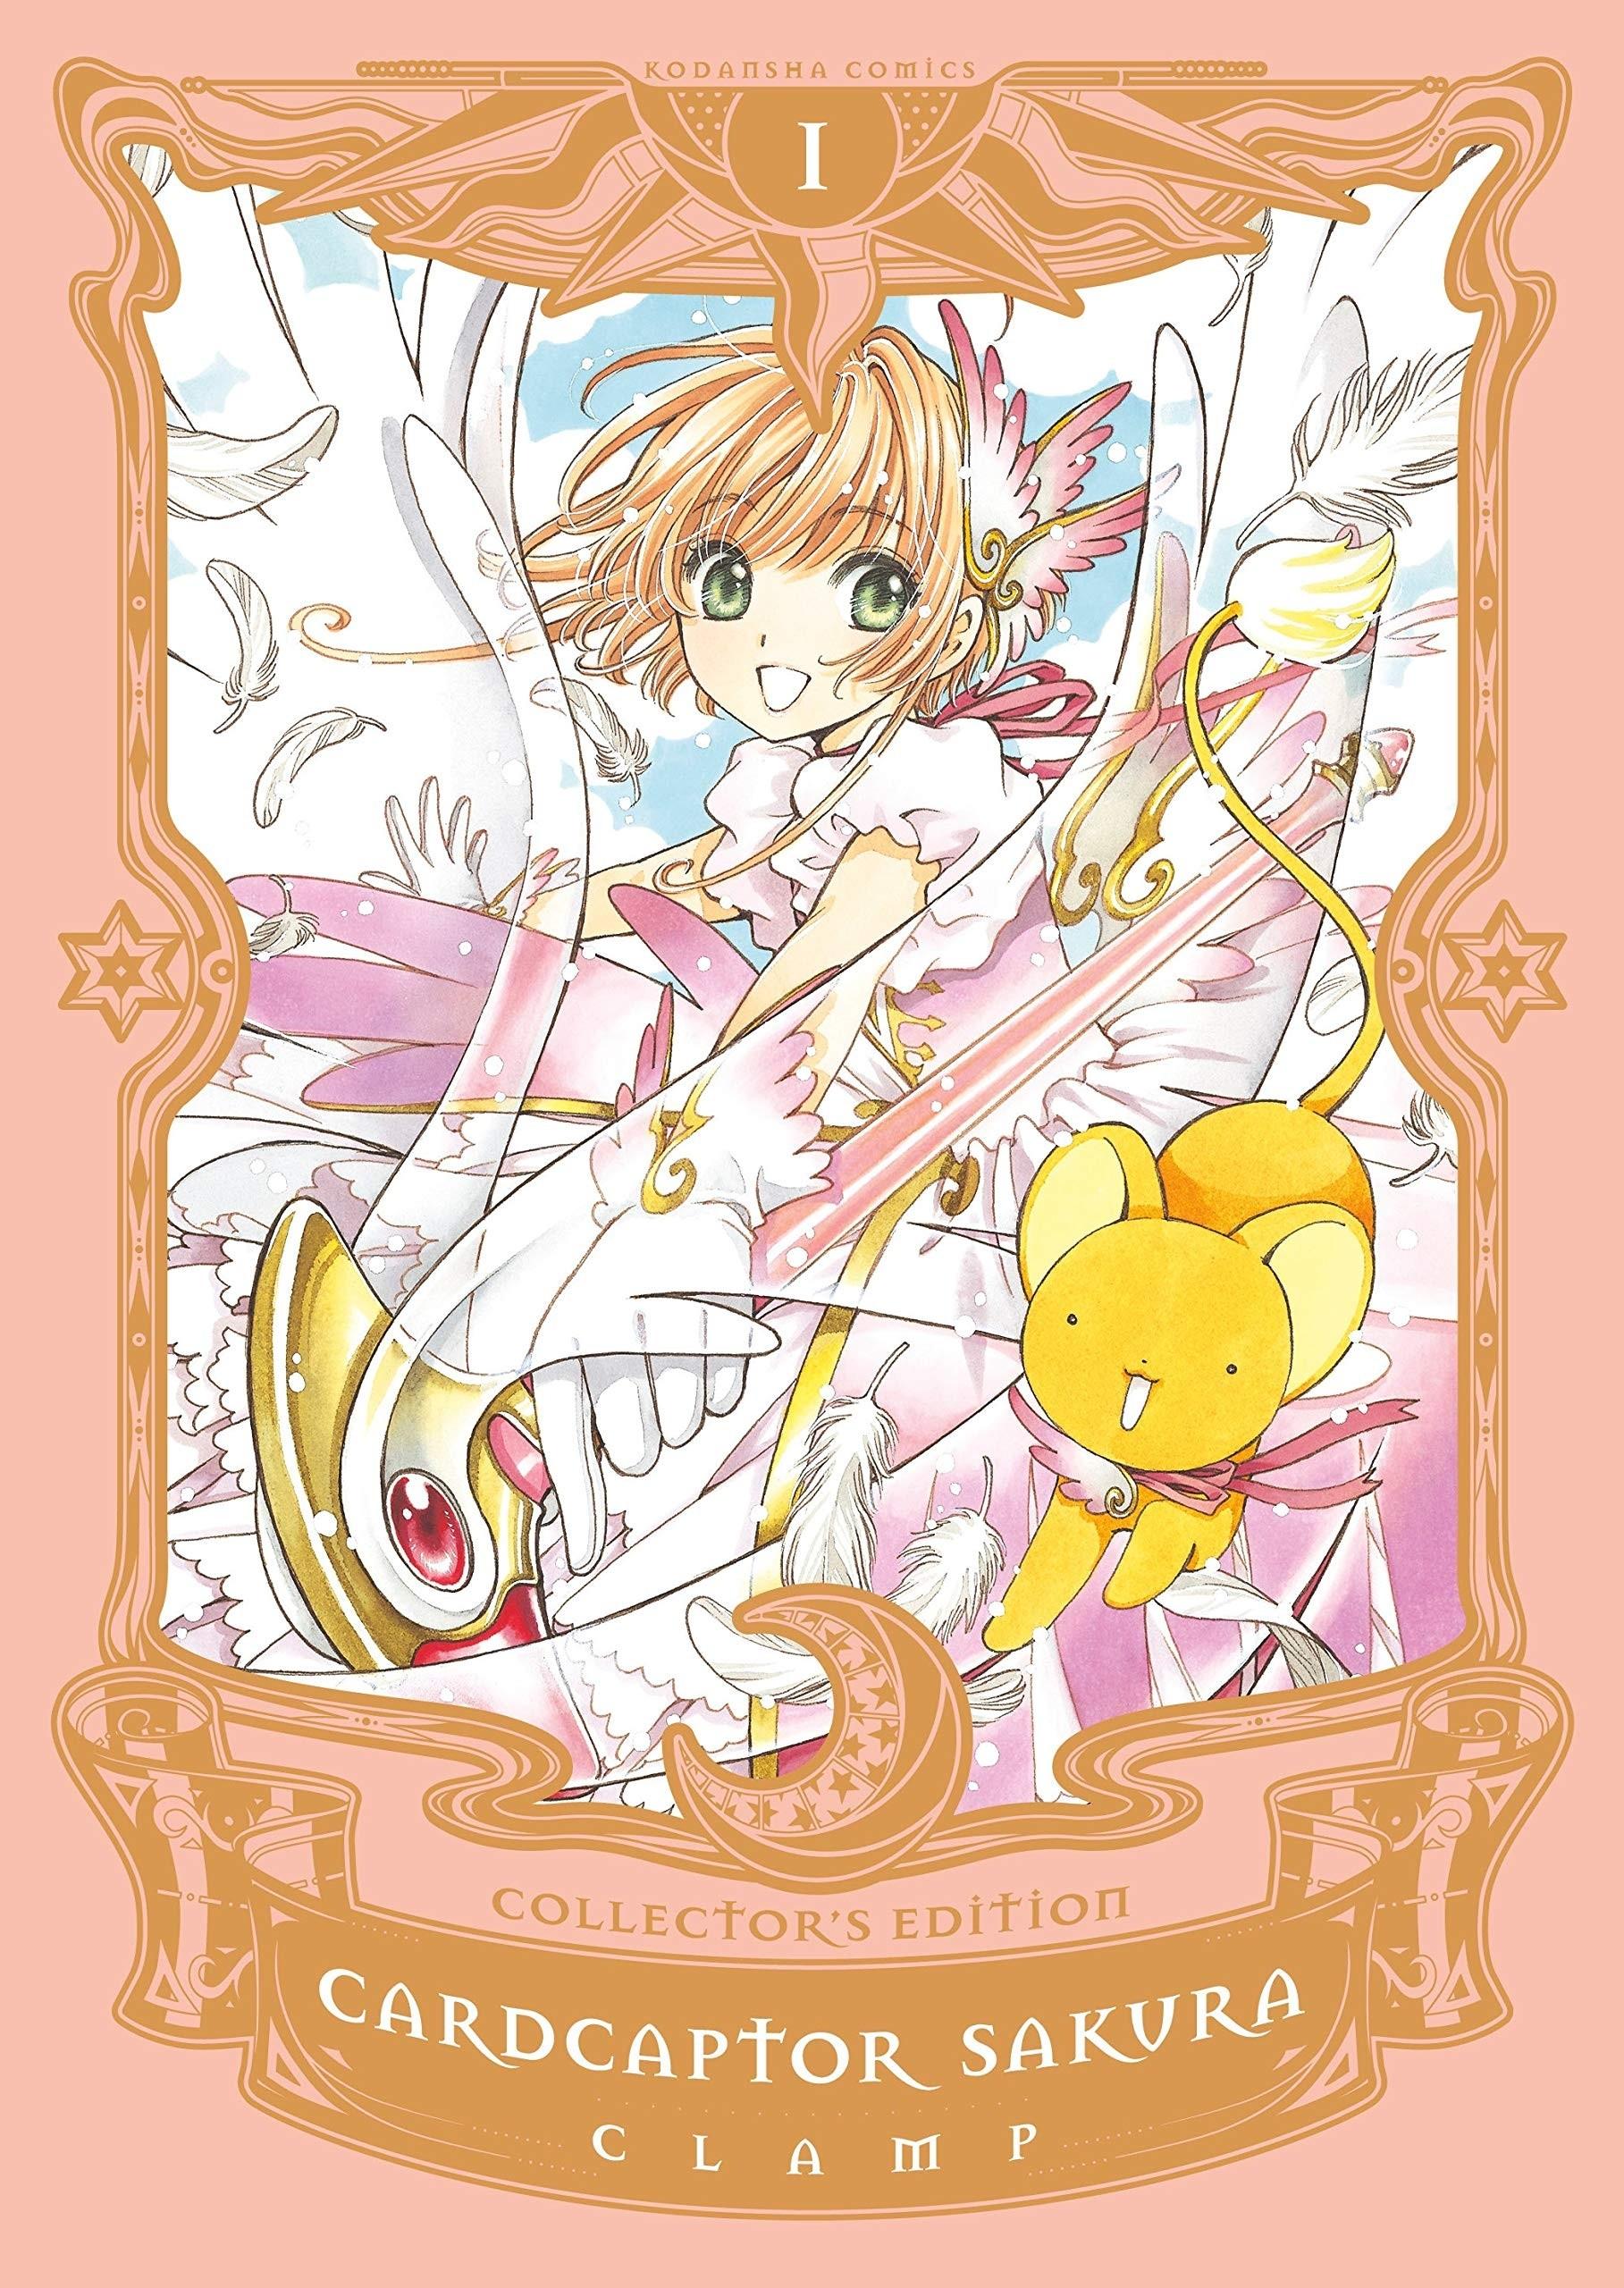 Cardcaptor Sakura Collector's Edition, Vol. 01